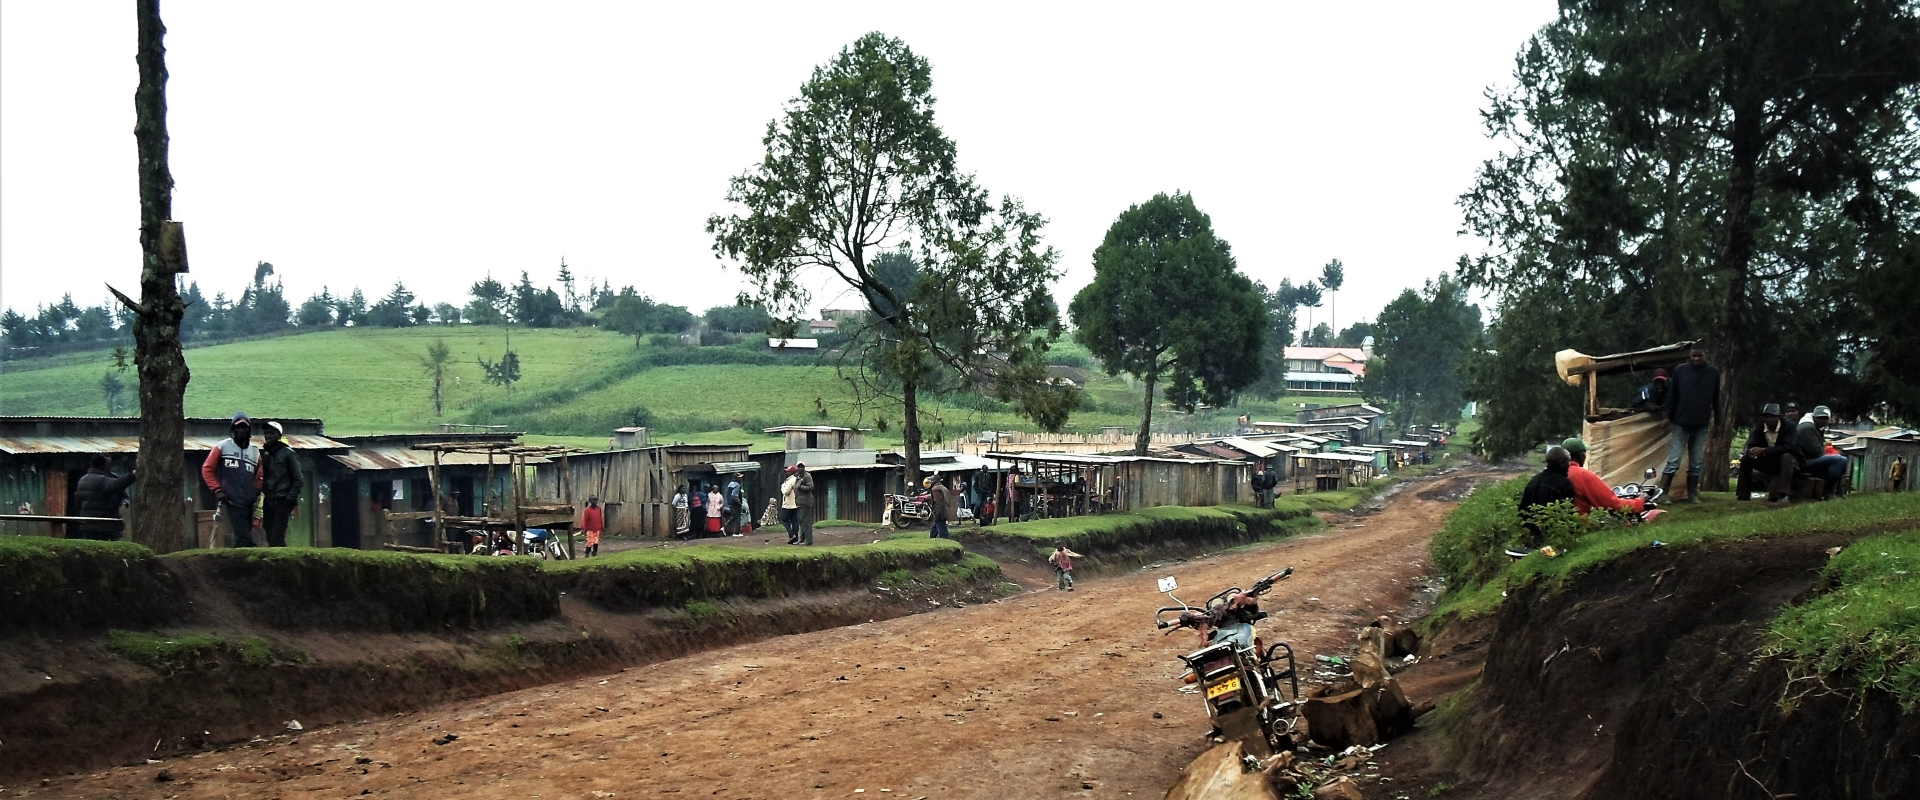 moto strada baracche Kenya Mani Tese 2017